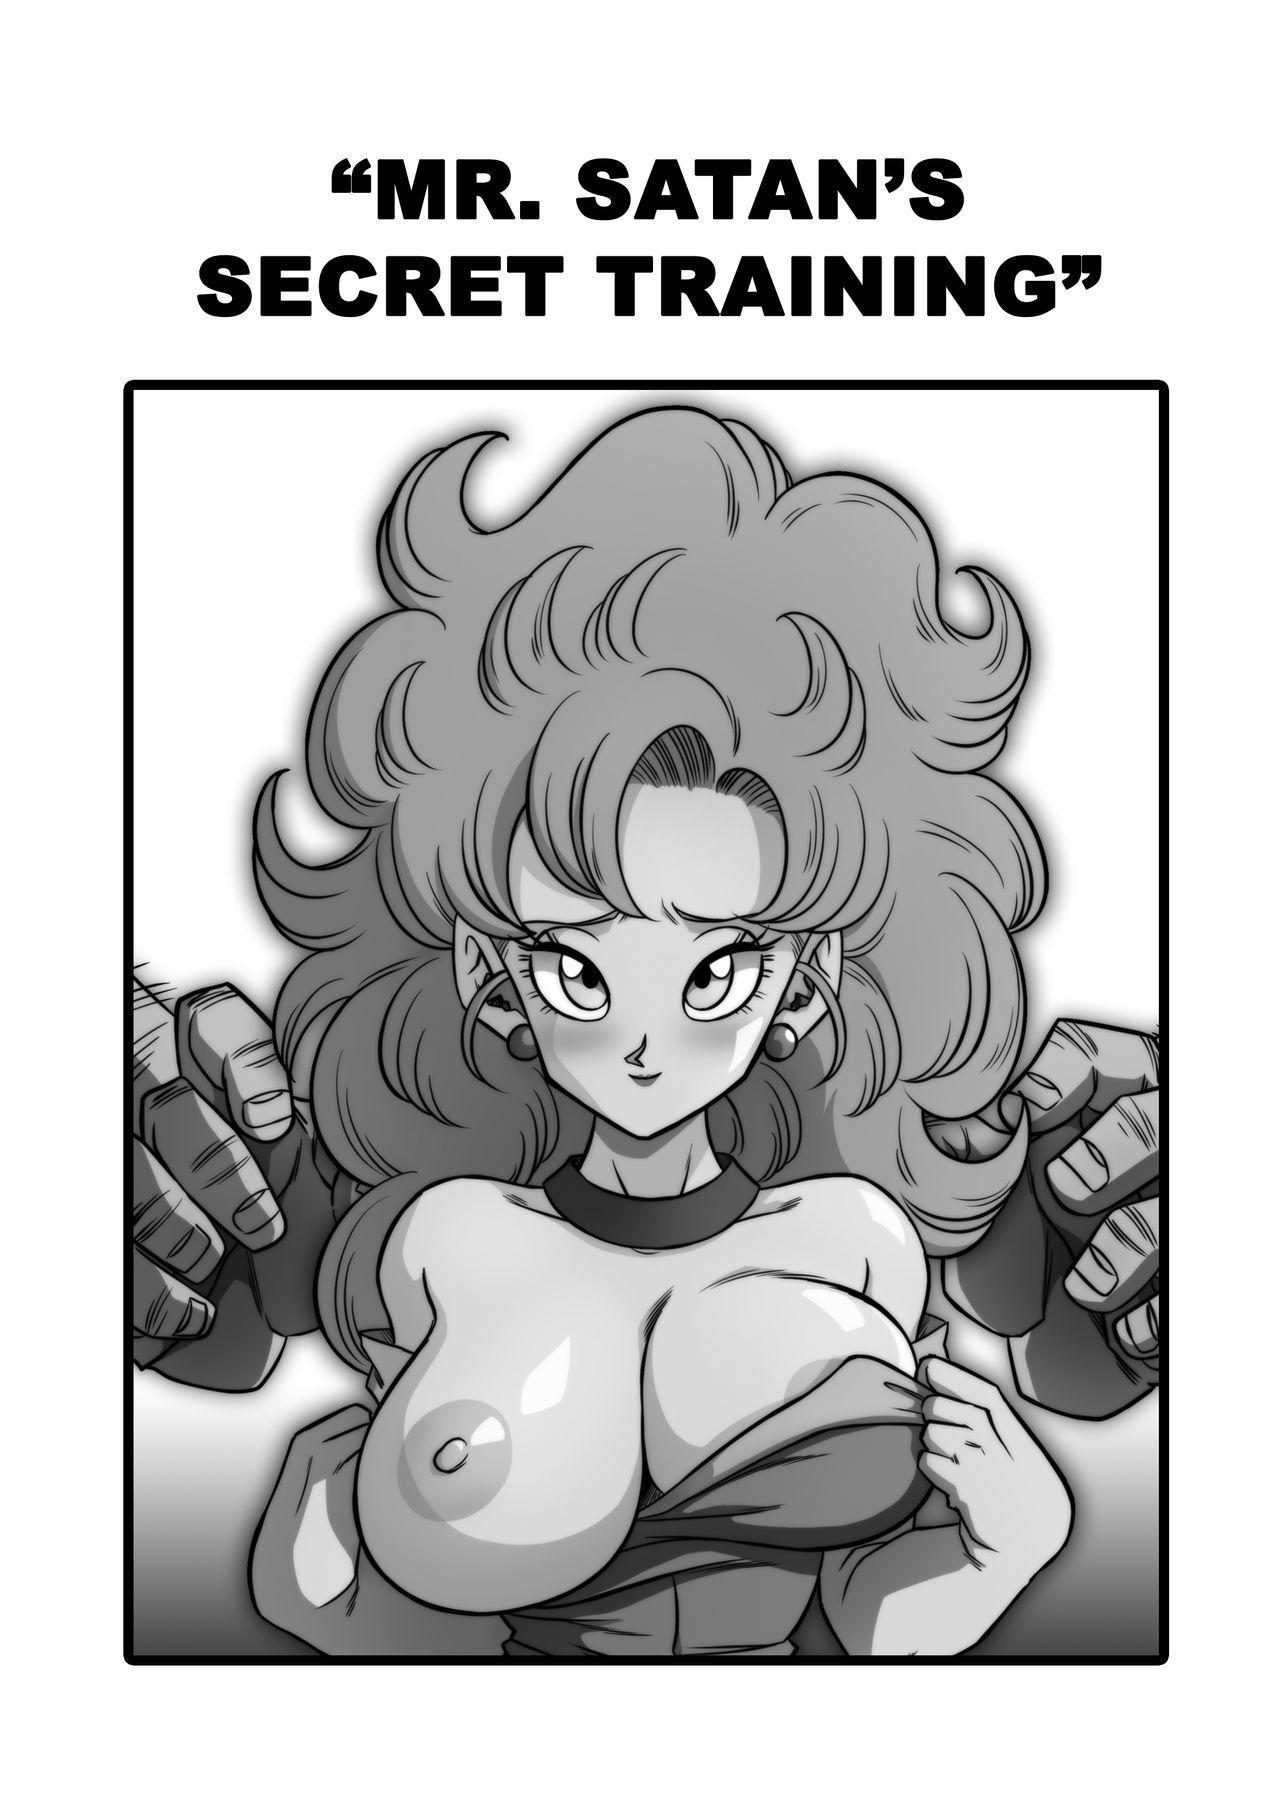 Mister Satan no Himitsu no Training | Mr. Satan's Secret Training 1